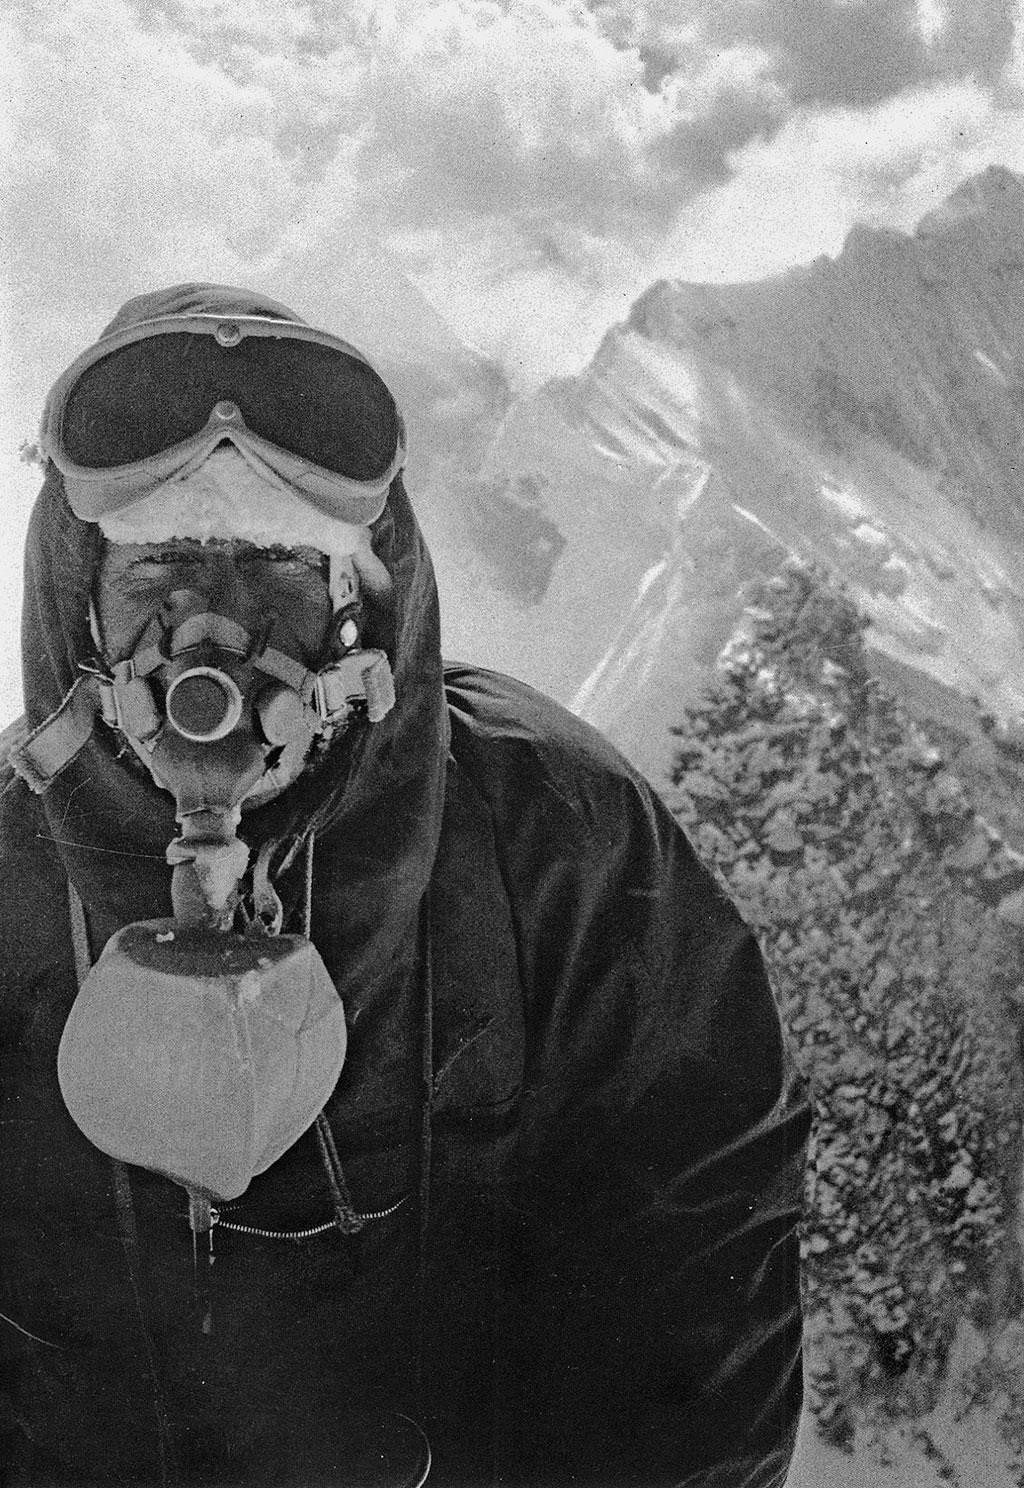 Fritz Luchsinger, Lhotse 1956